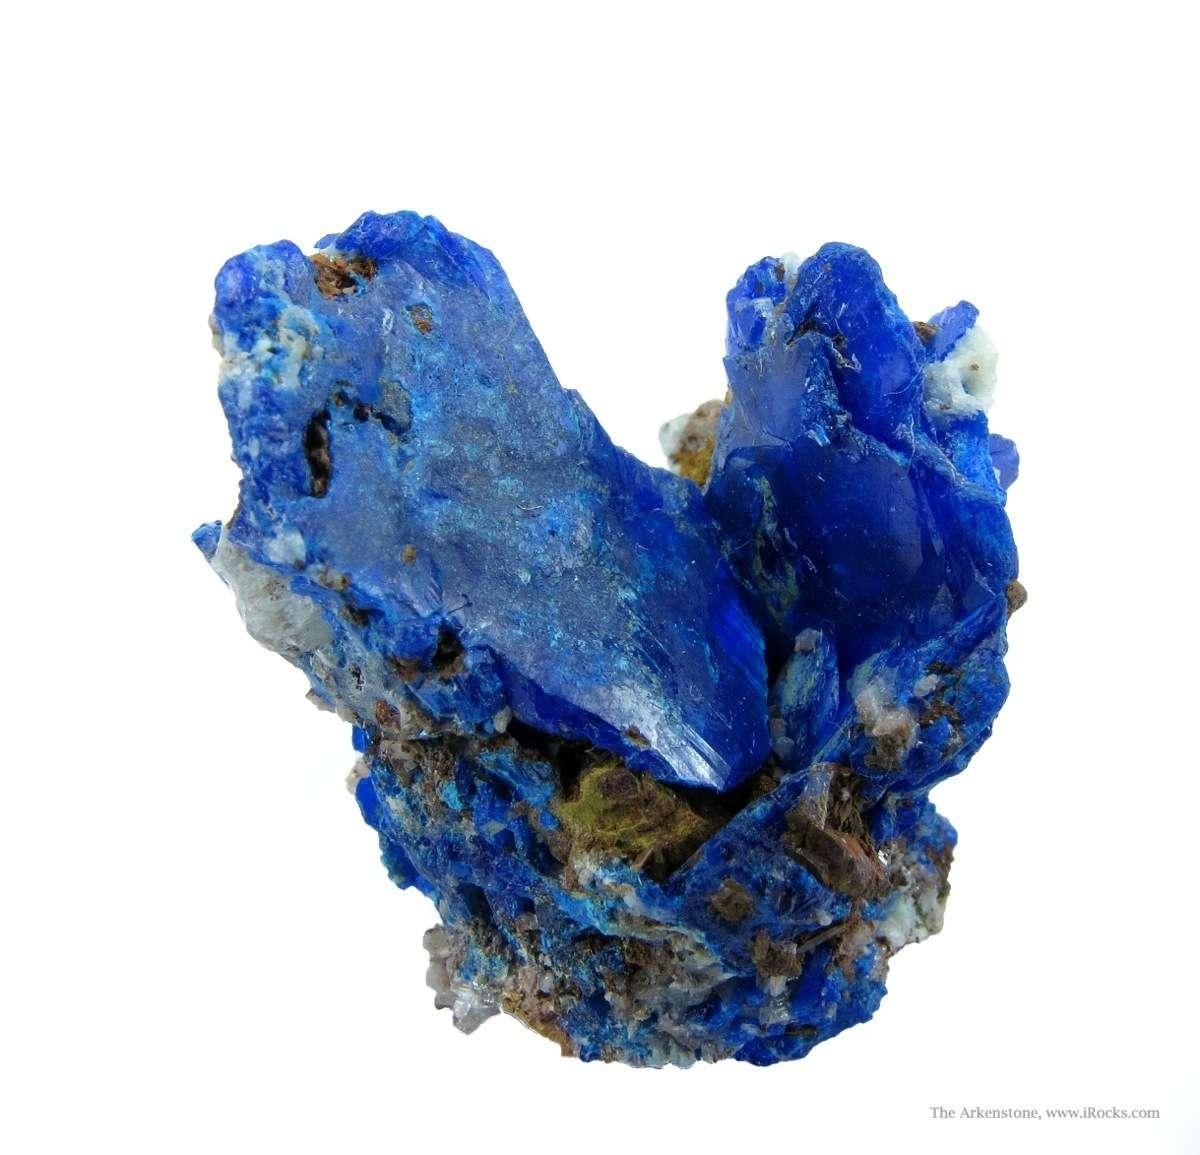 A rare lead copper chloride vivid blue Diaboleite Collins vein